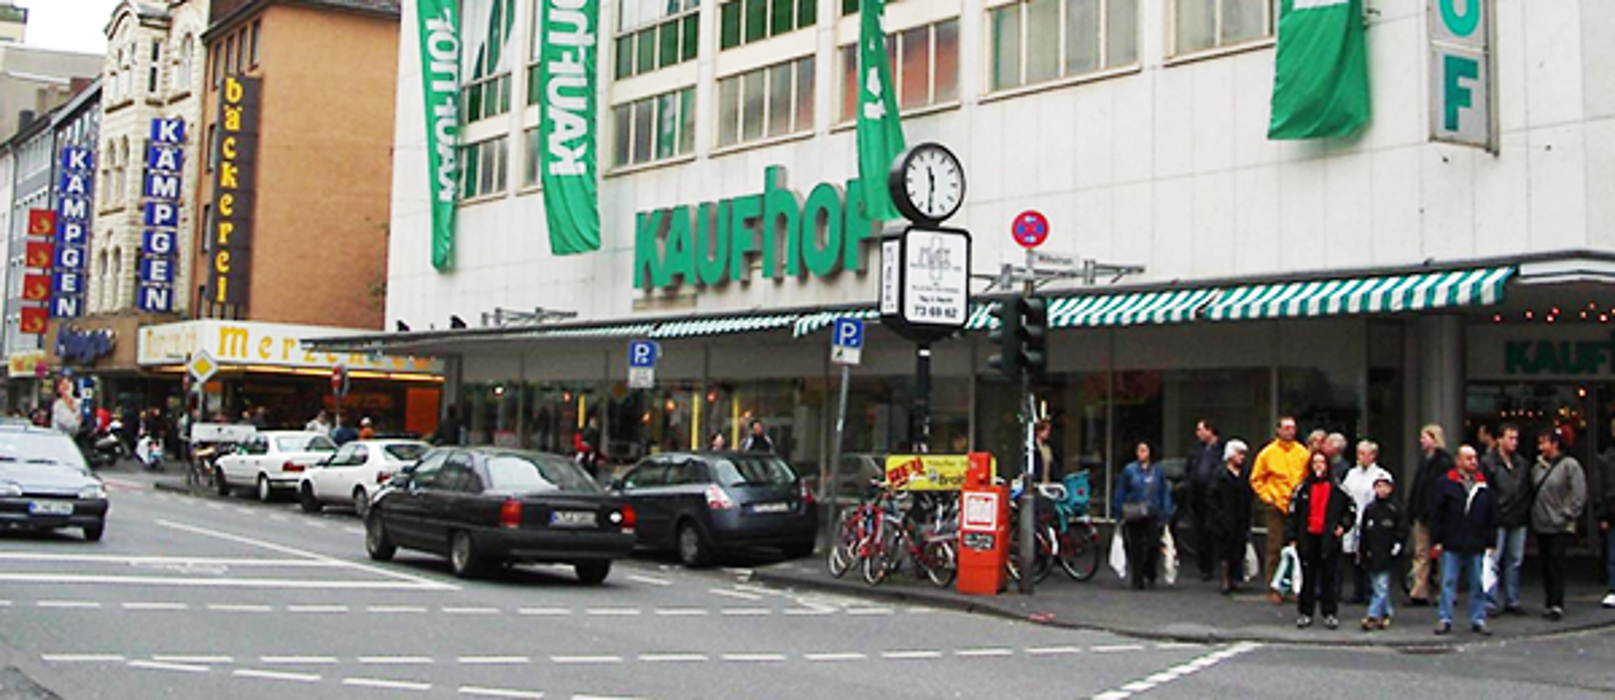 GALERIA (Kaufhof) Köln Nippes, Neusser Str. in Köln